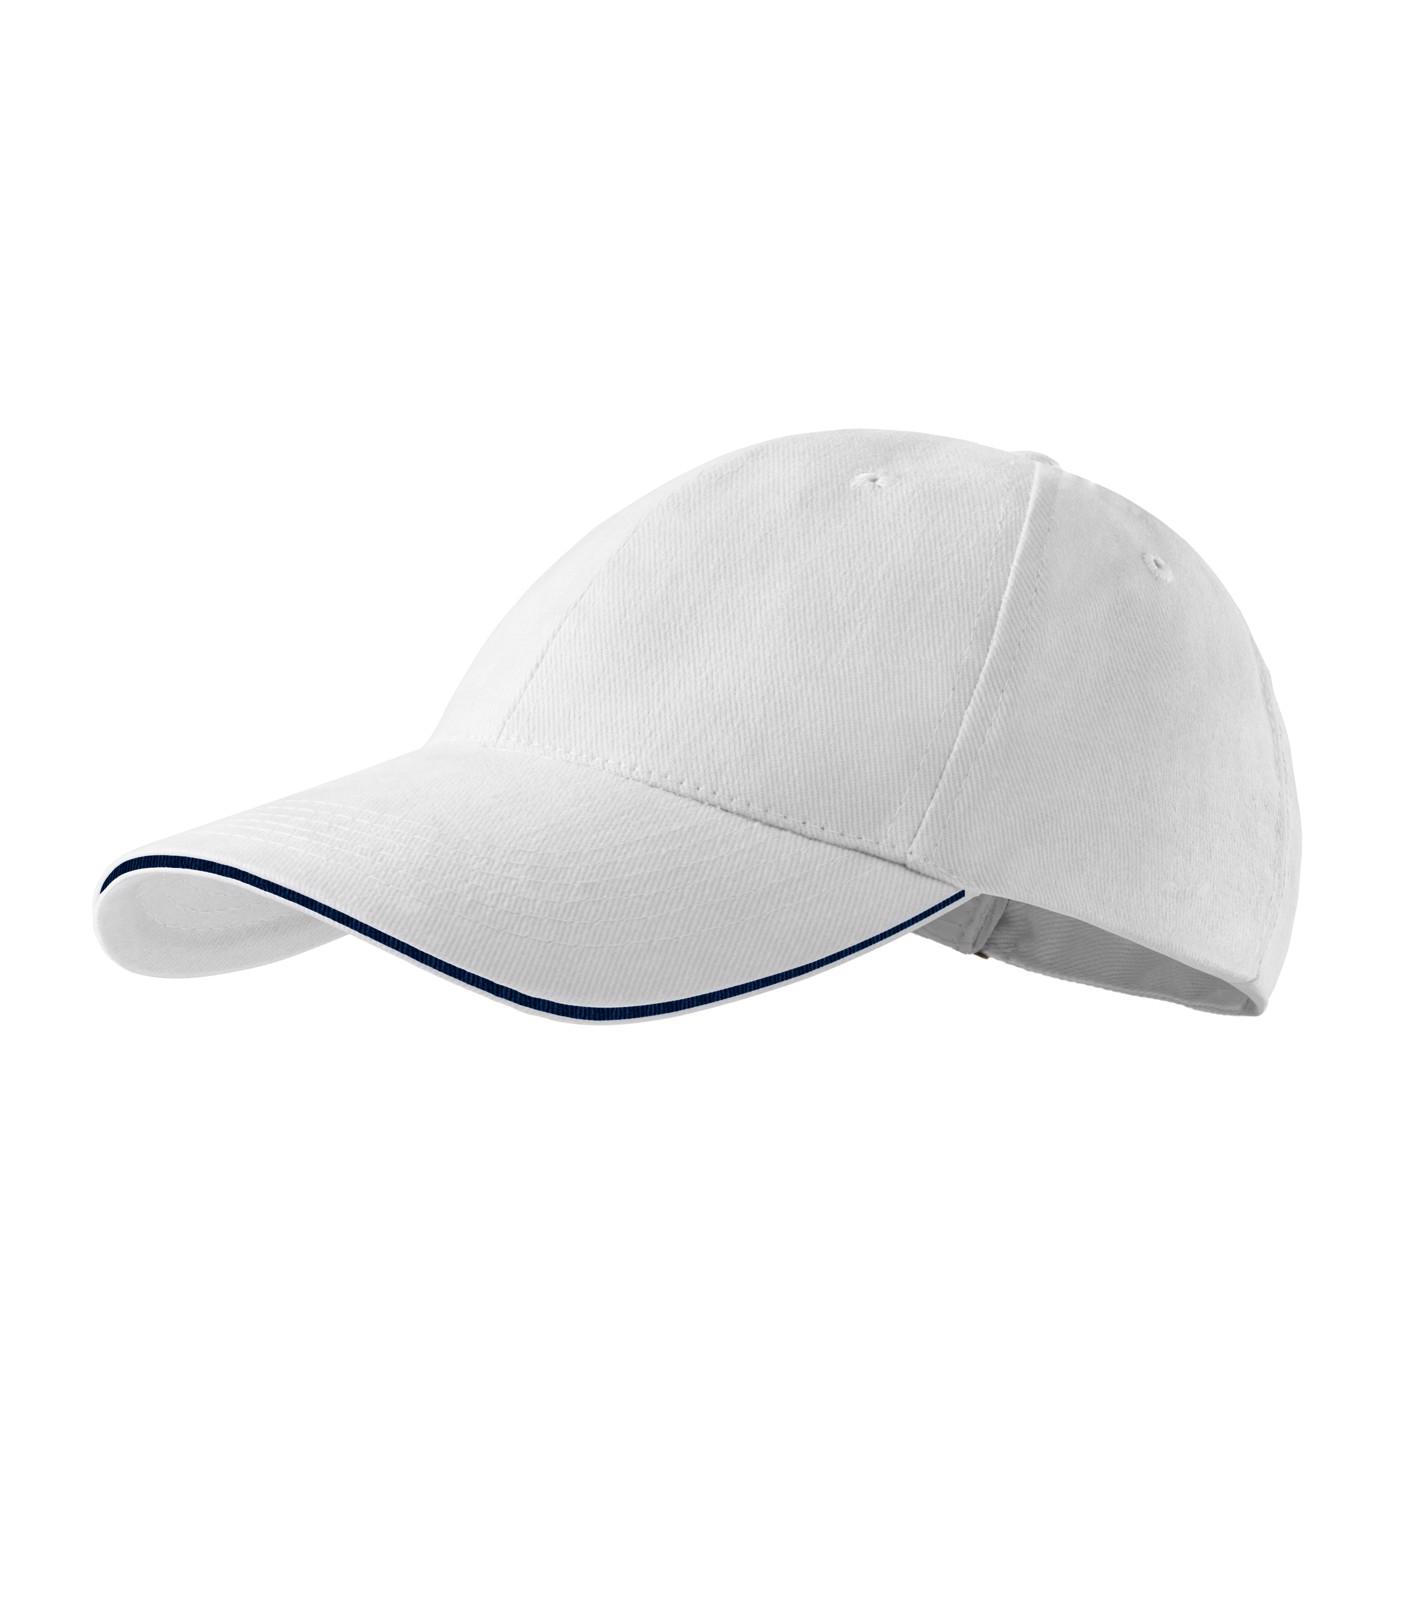 Cap unisex Malfini Sandwich 6P - White / adjustable